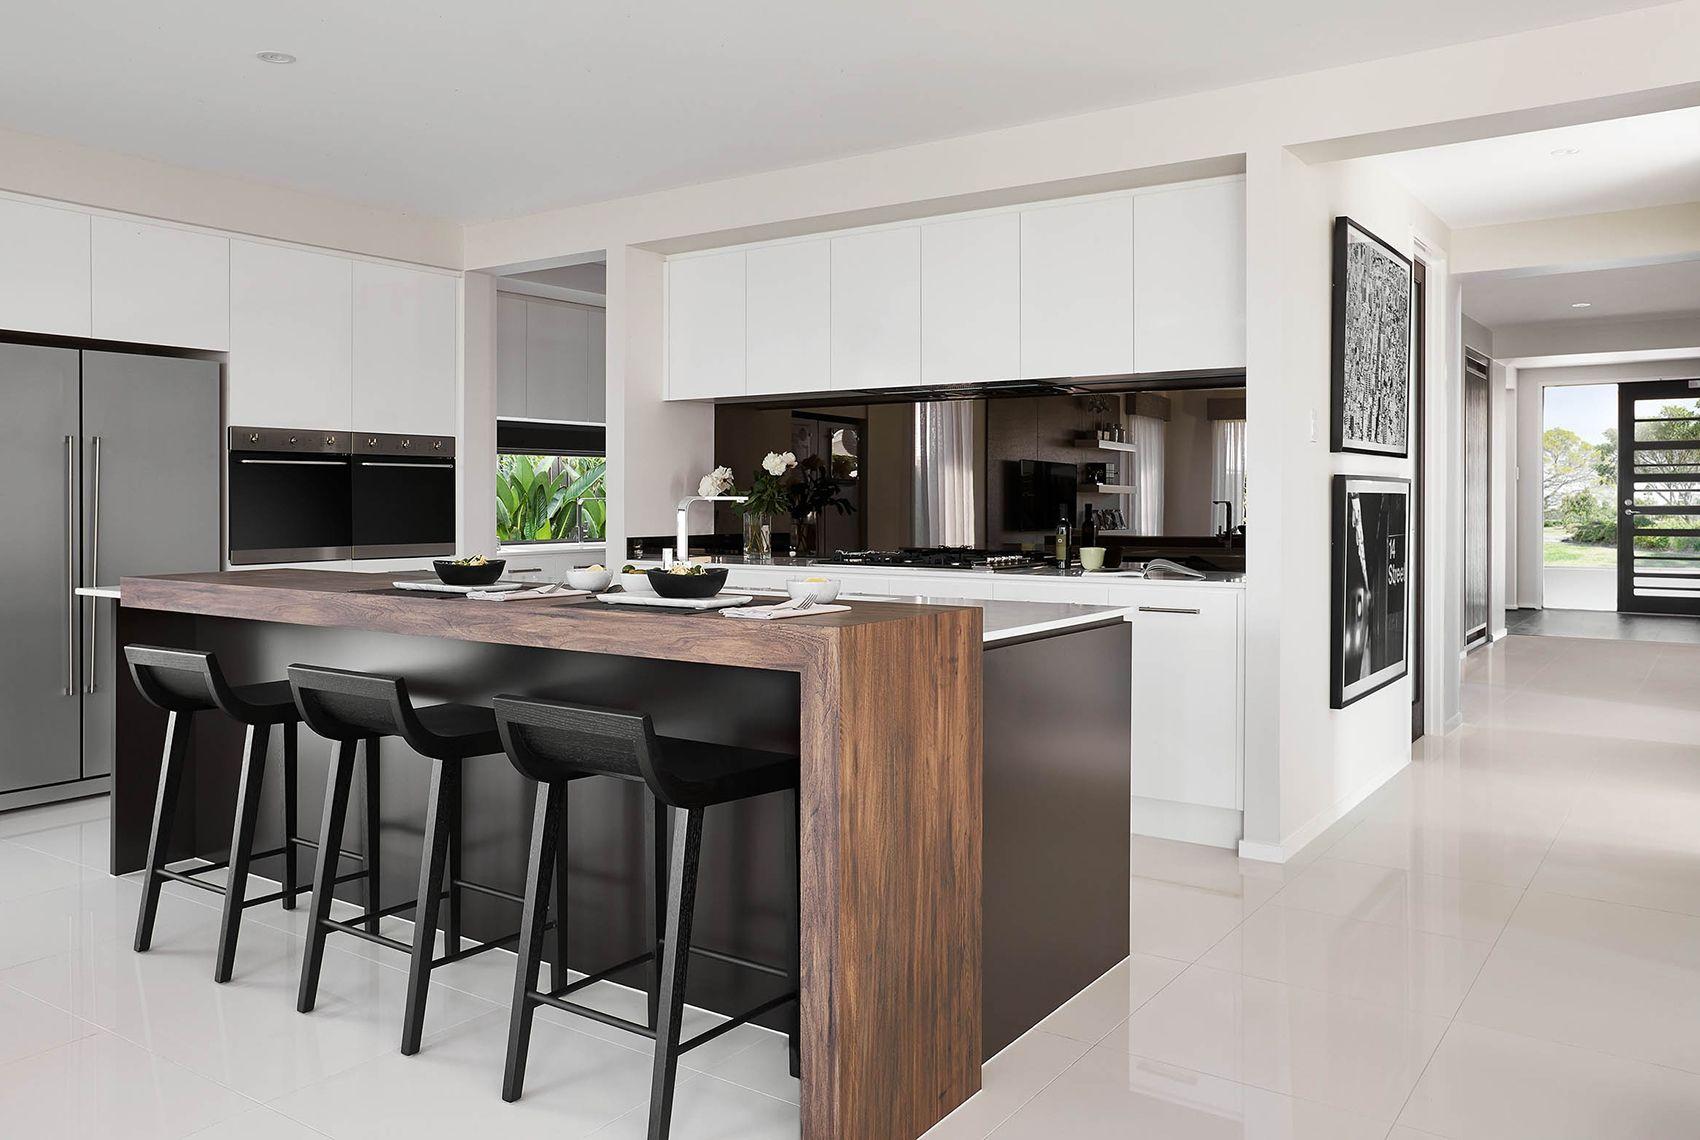 Sahara 39 Kitchen and entry Kitchen room design, Kitchen